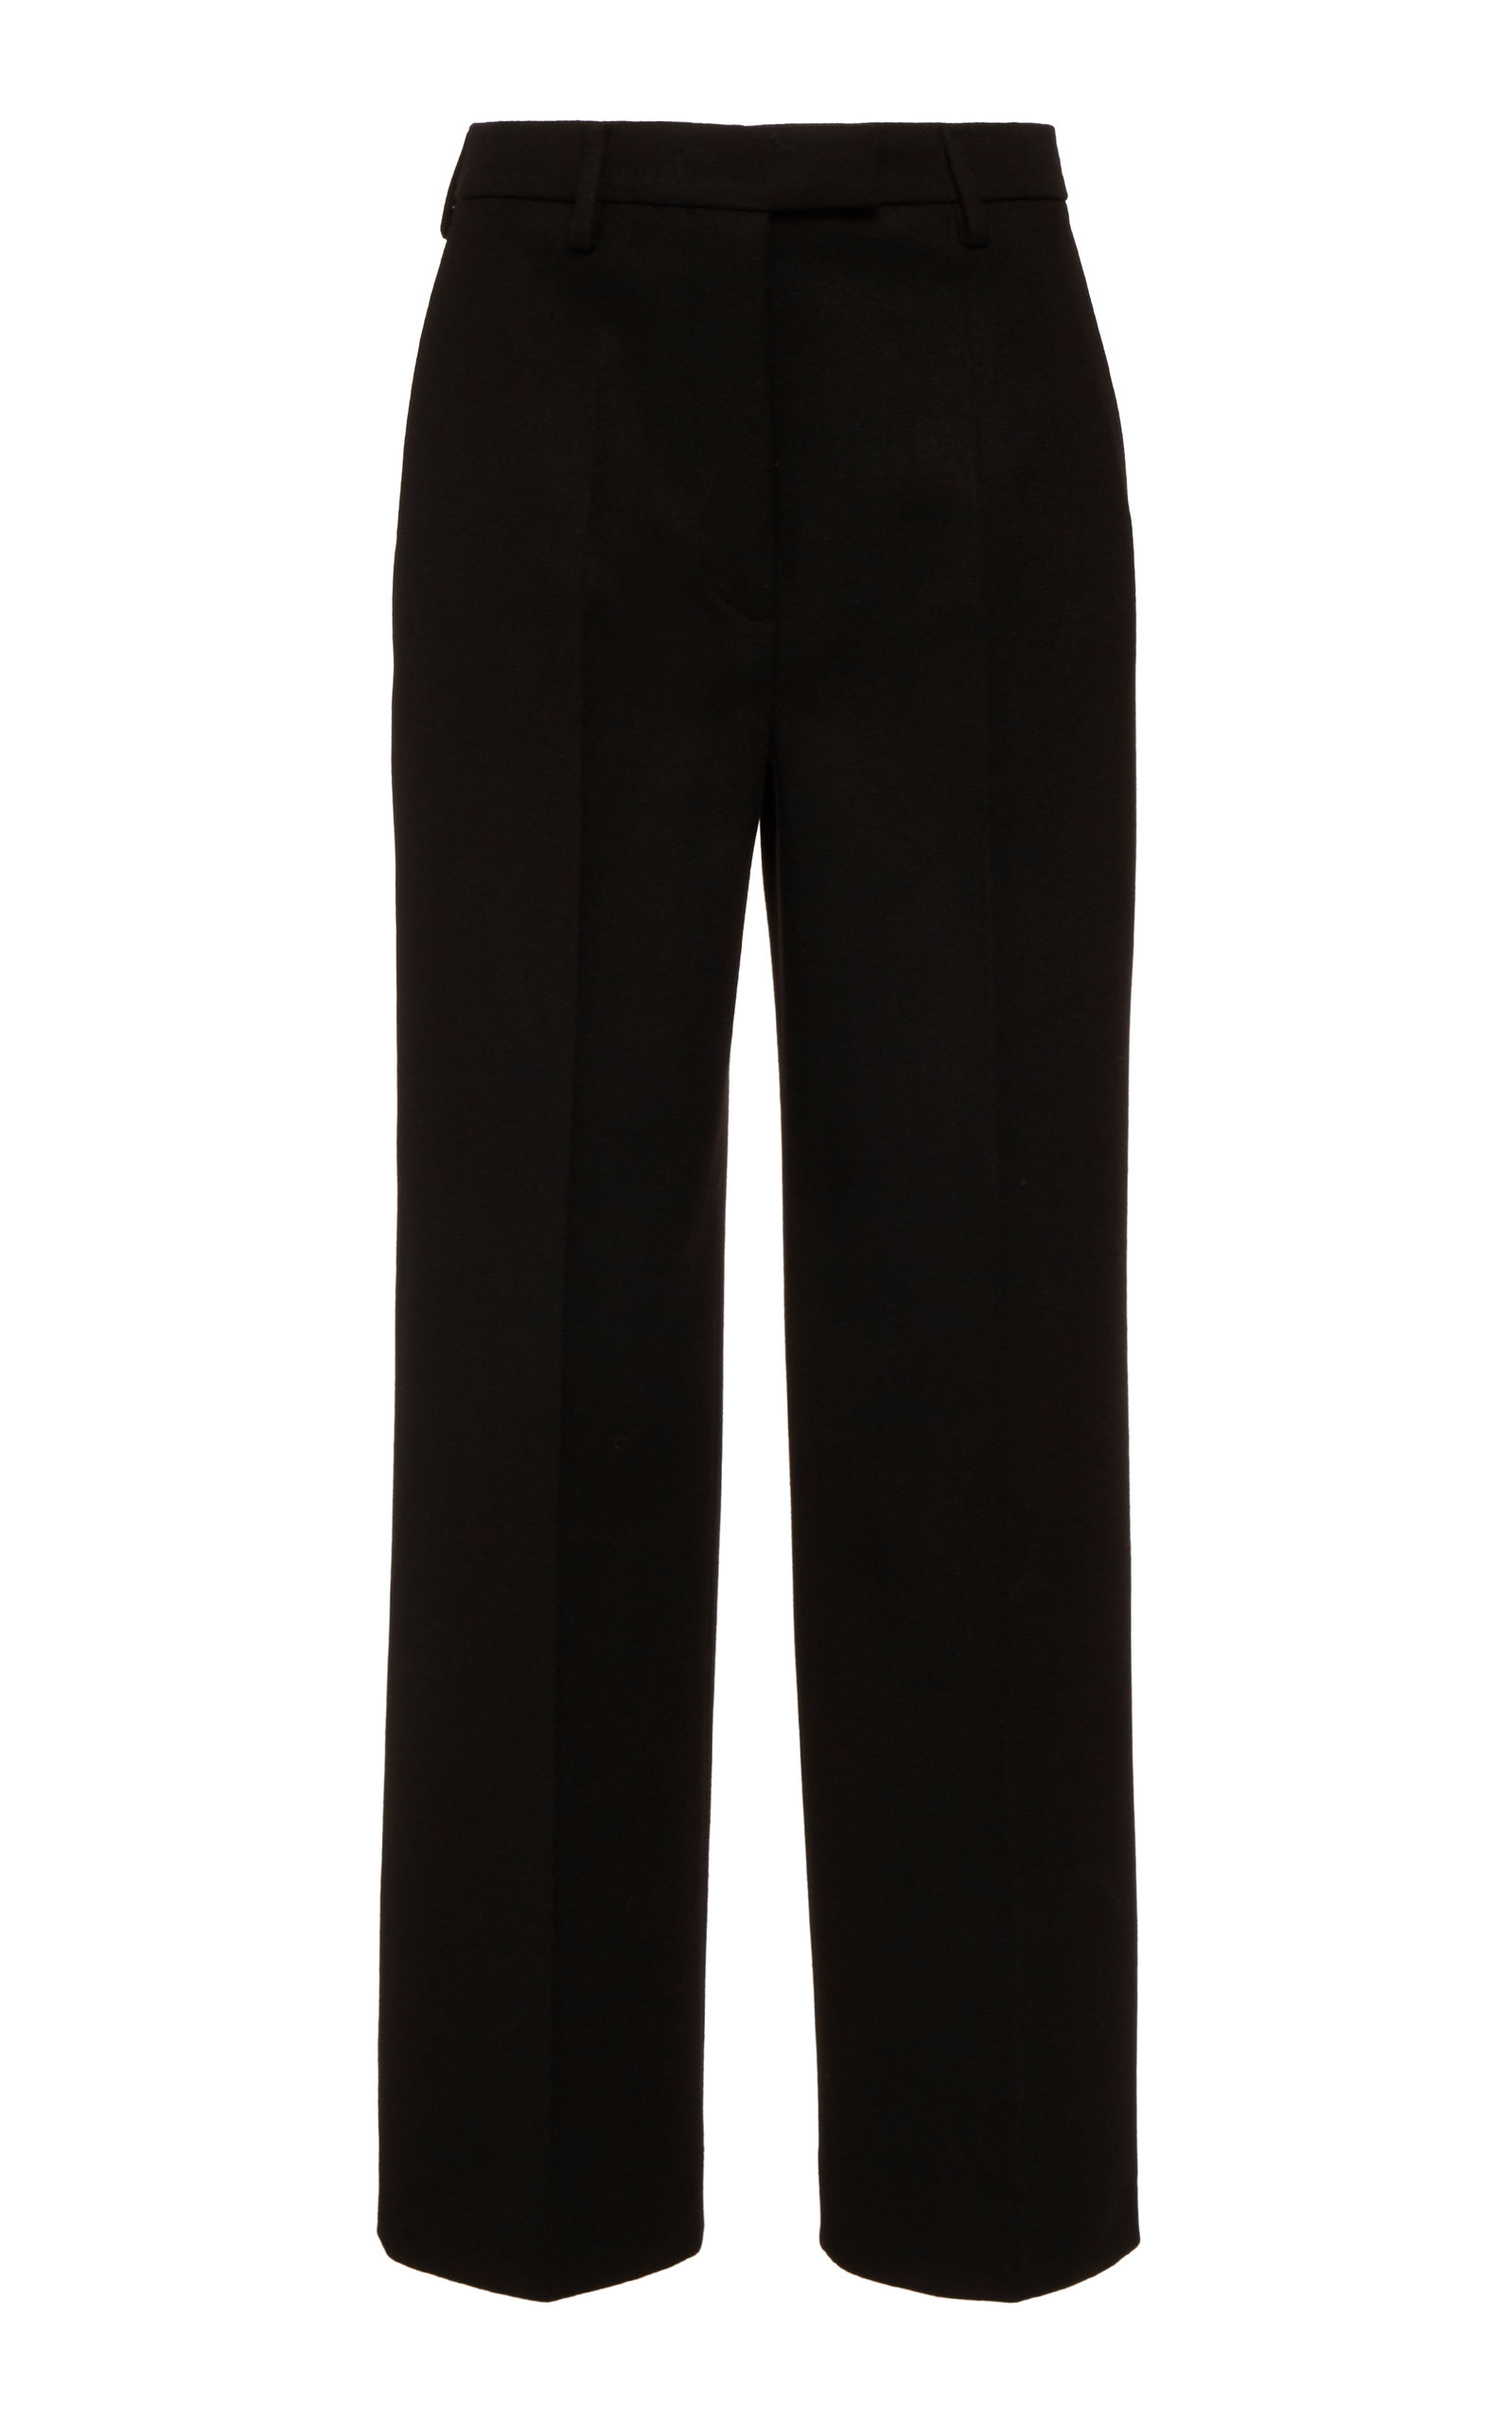 Prada Pants Straight-Leg Wool Trousers